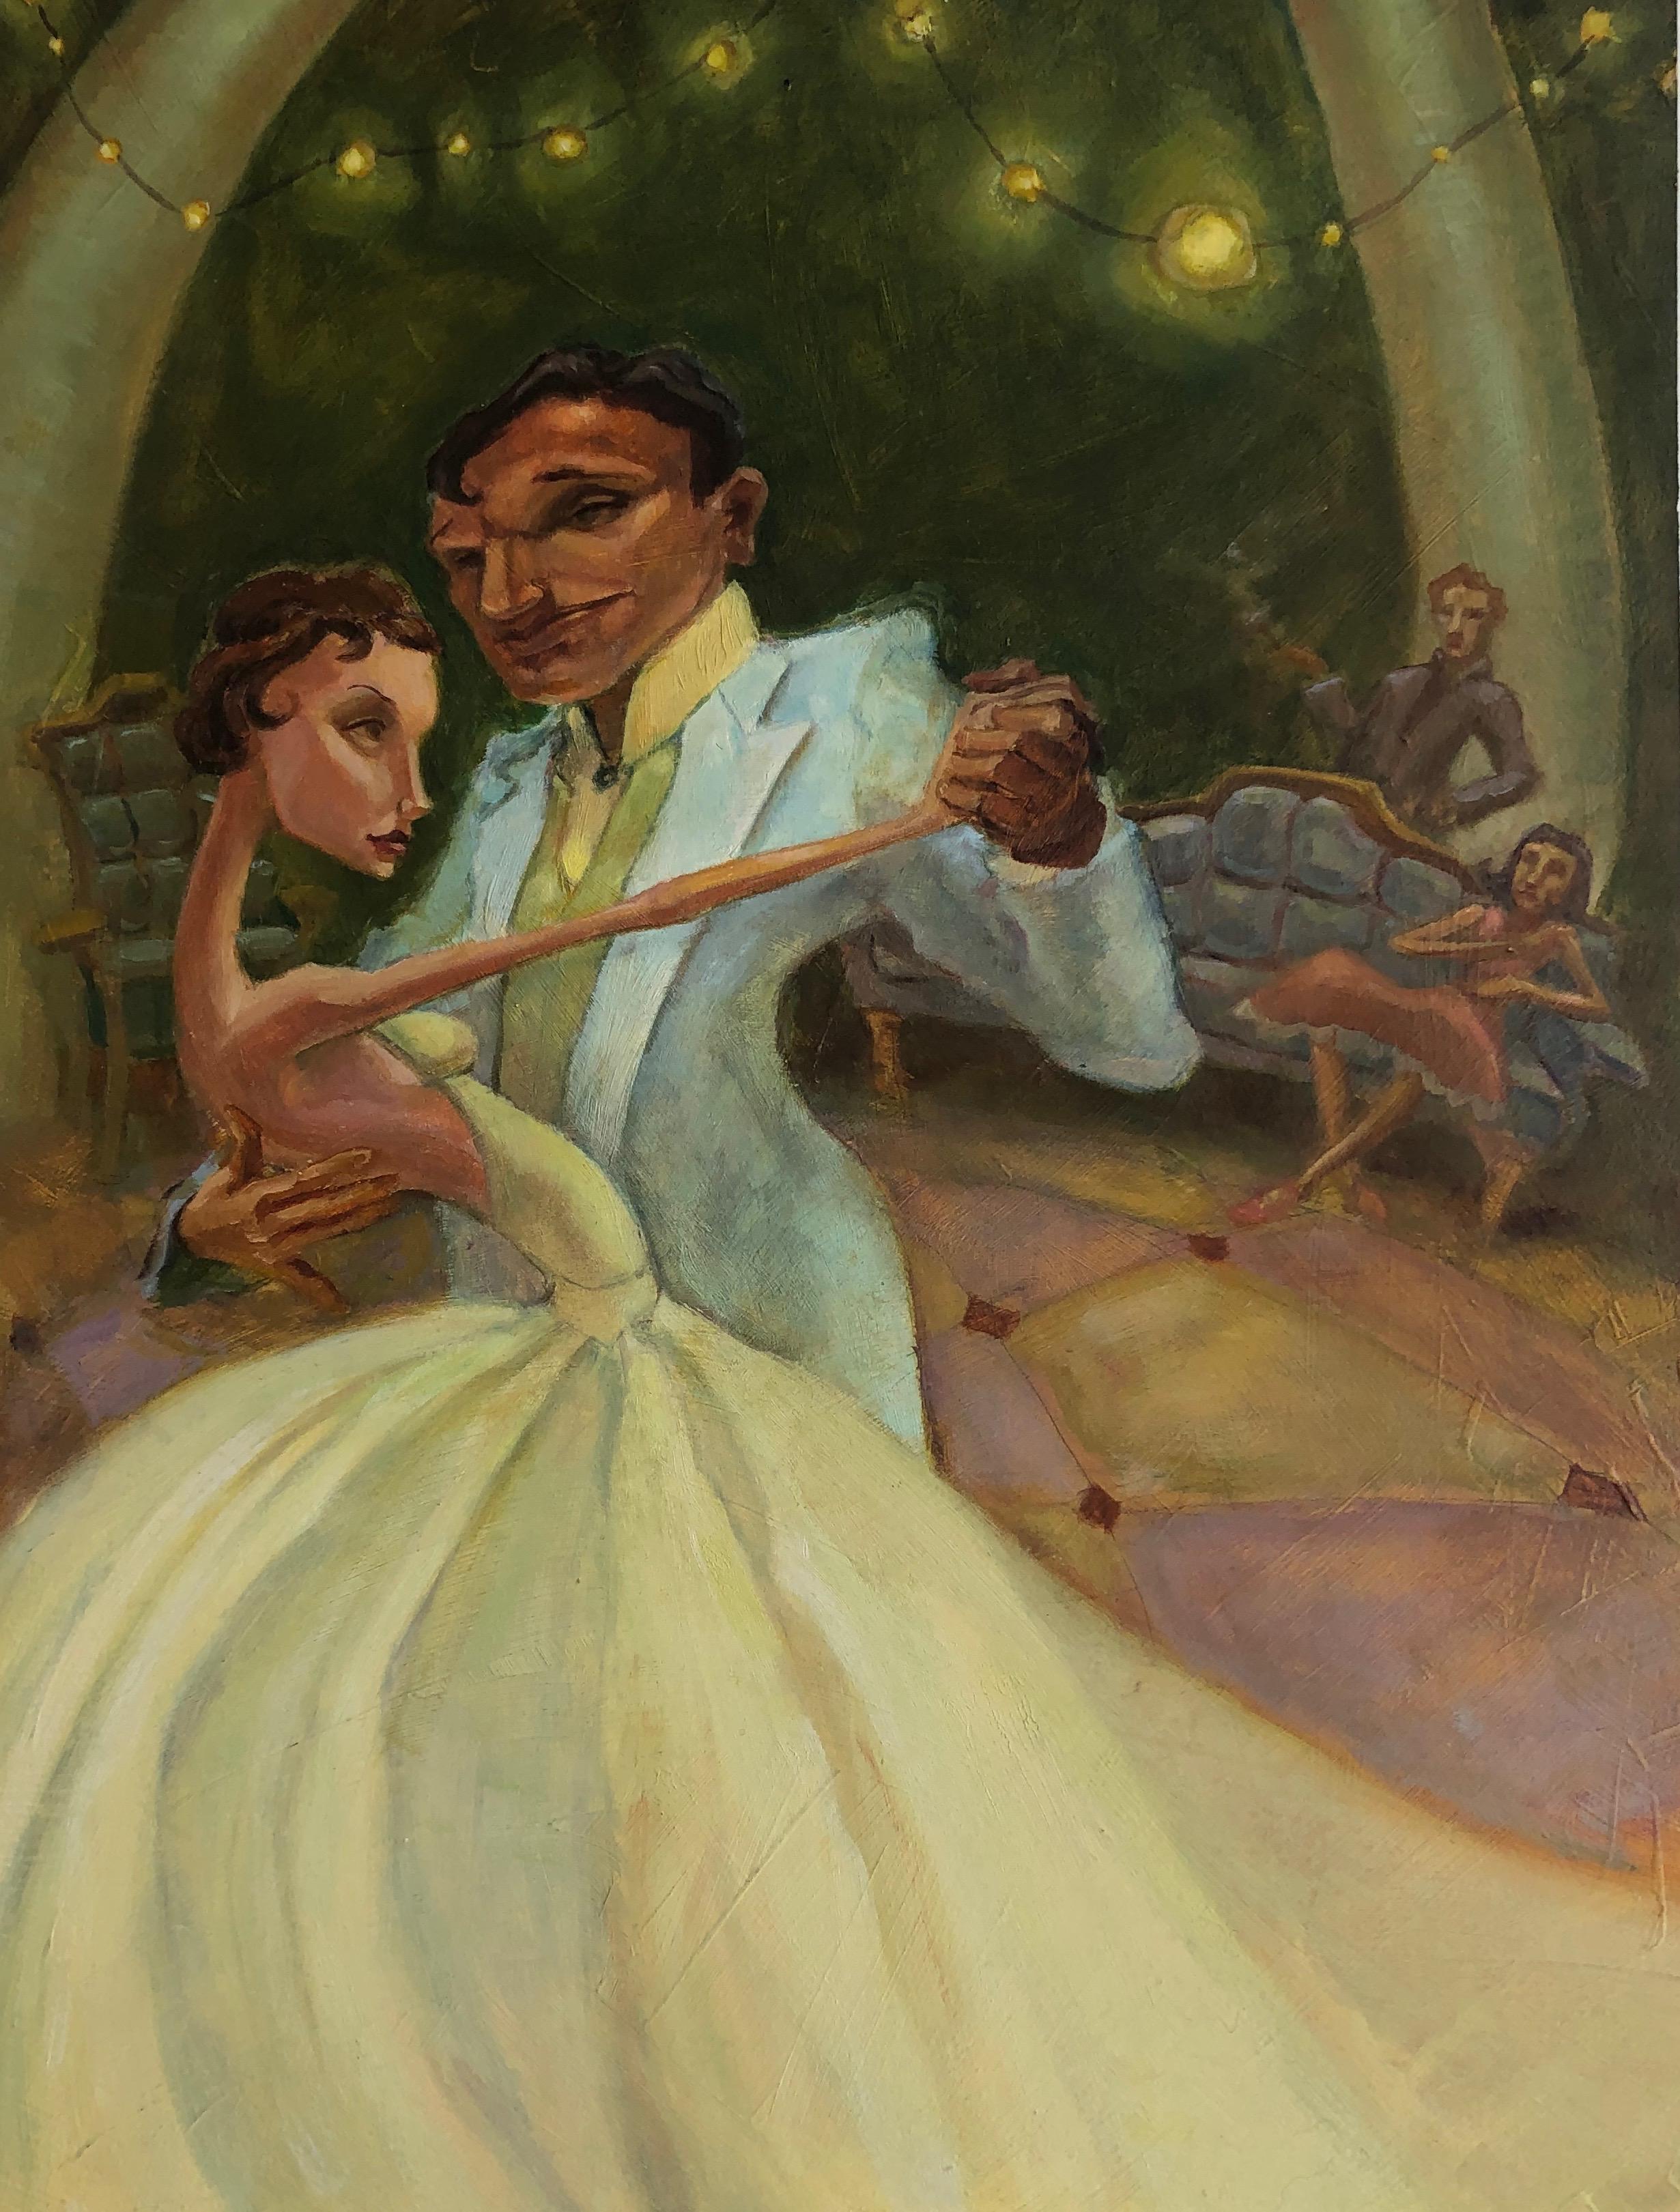 Dancingcouple.JPG